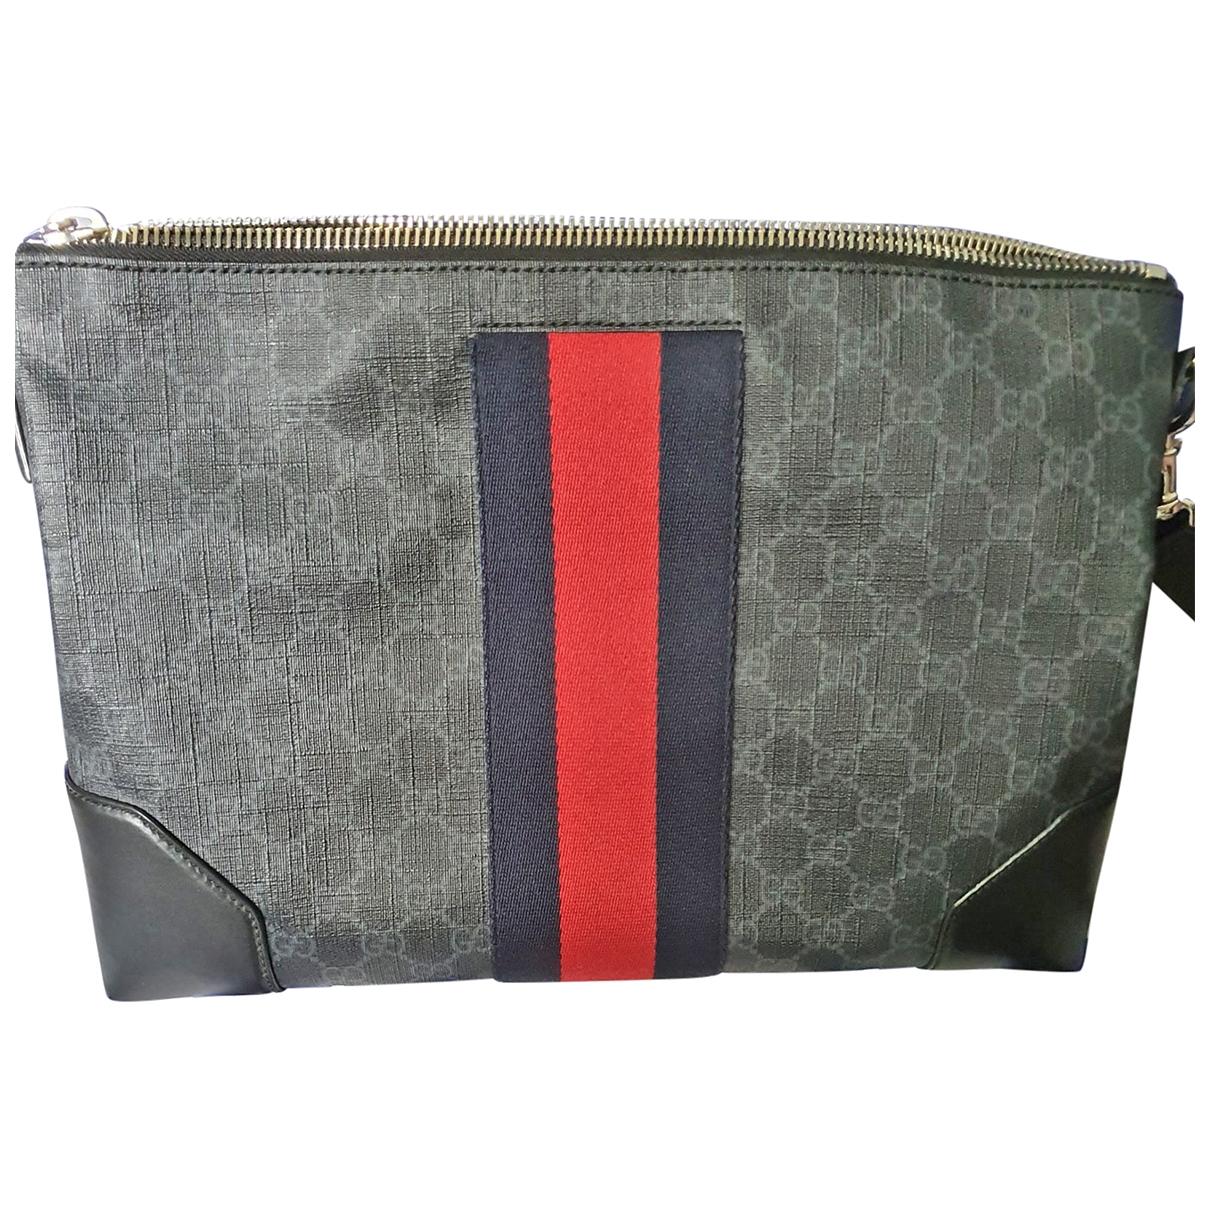 Gucci \N Anthracite Cloth bag for Men \N